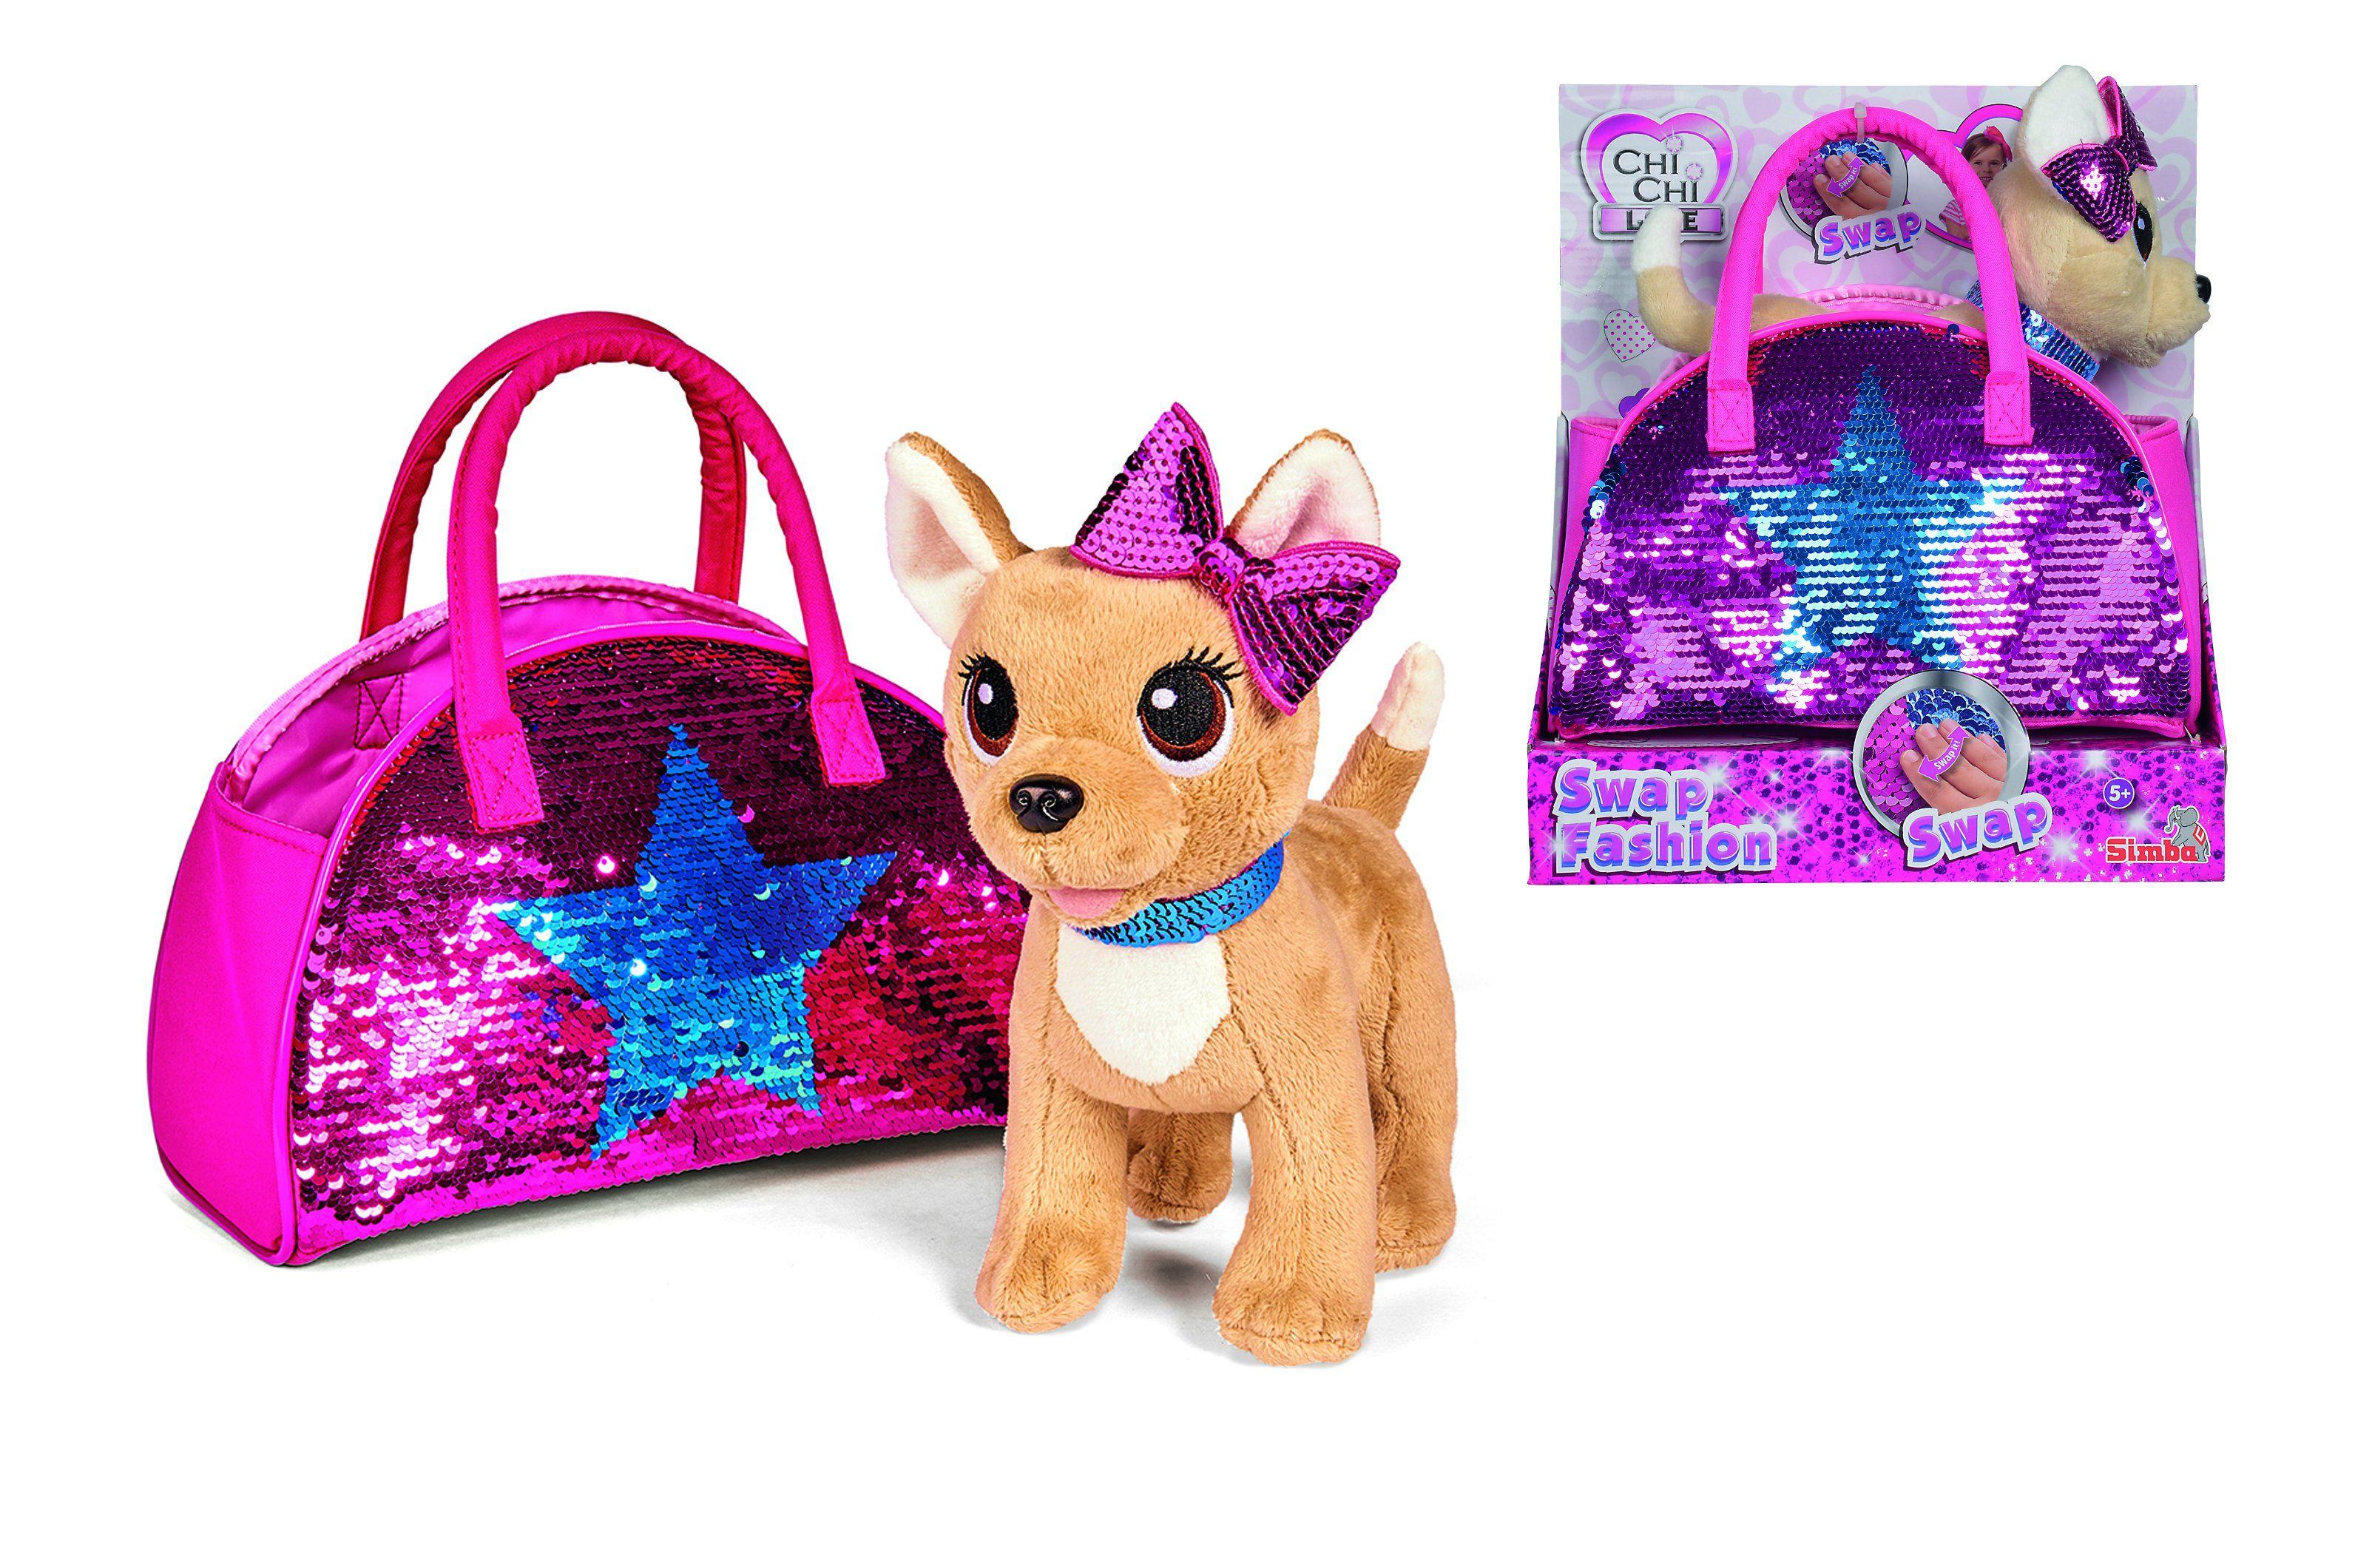 Simba Chi Chi Love Piesek Cekinowa Gwiazda Brykacze Pl Sklep Z Zabawkami Chi Chi Simba Chihuahua